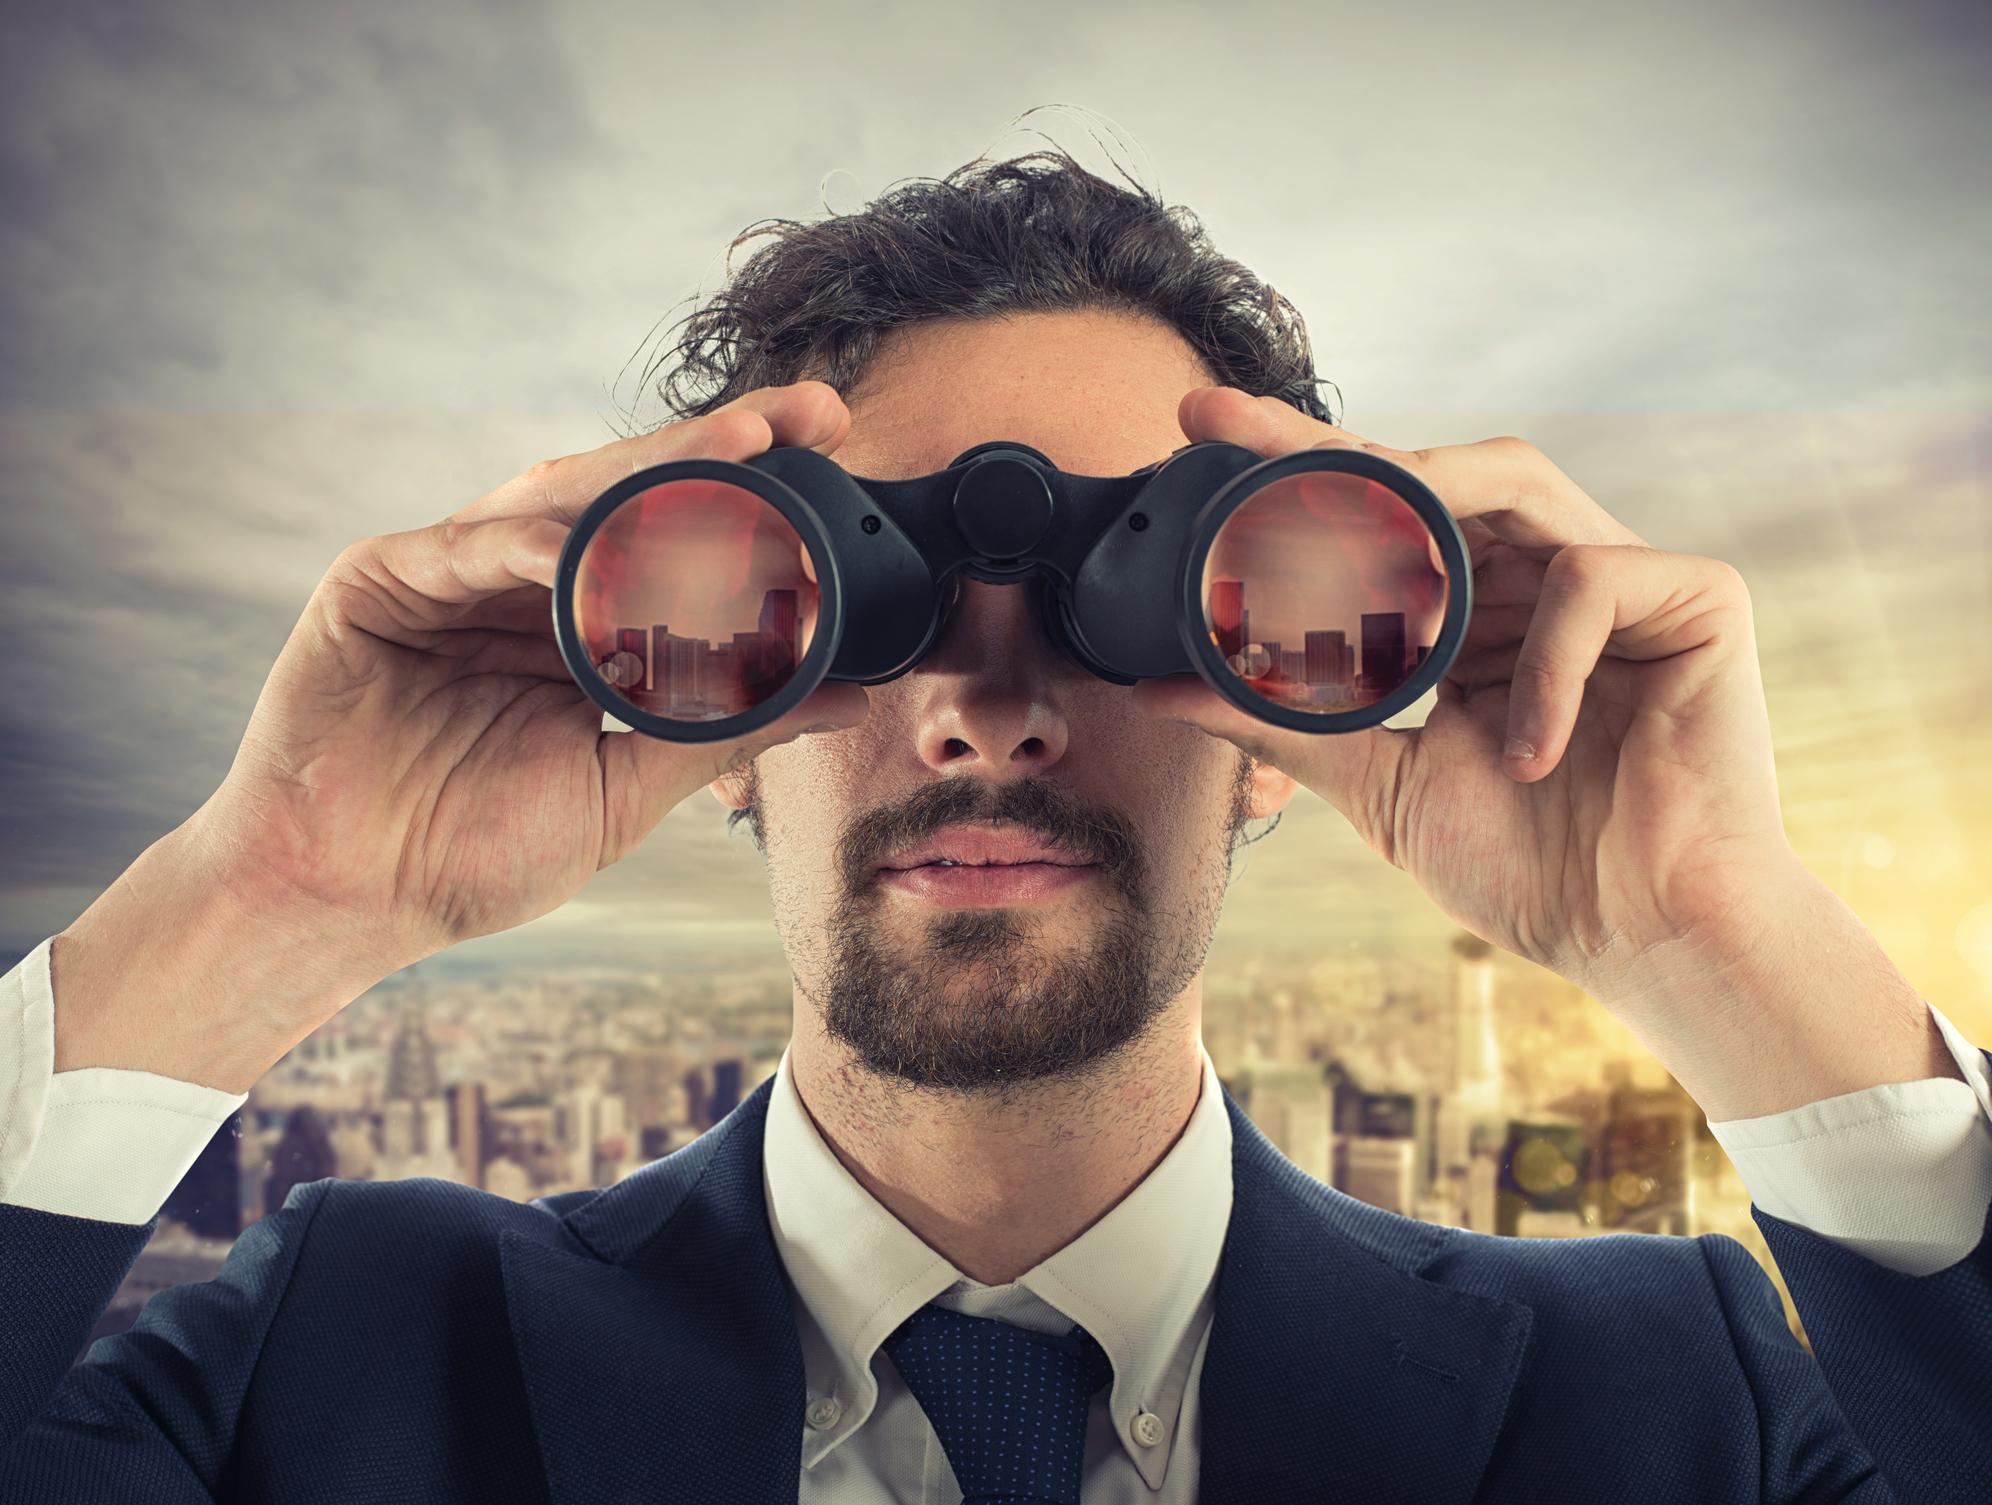 A man wearing a suit looking through binoculars.